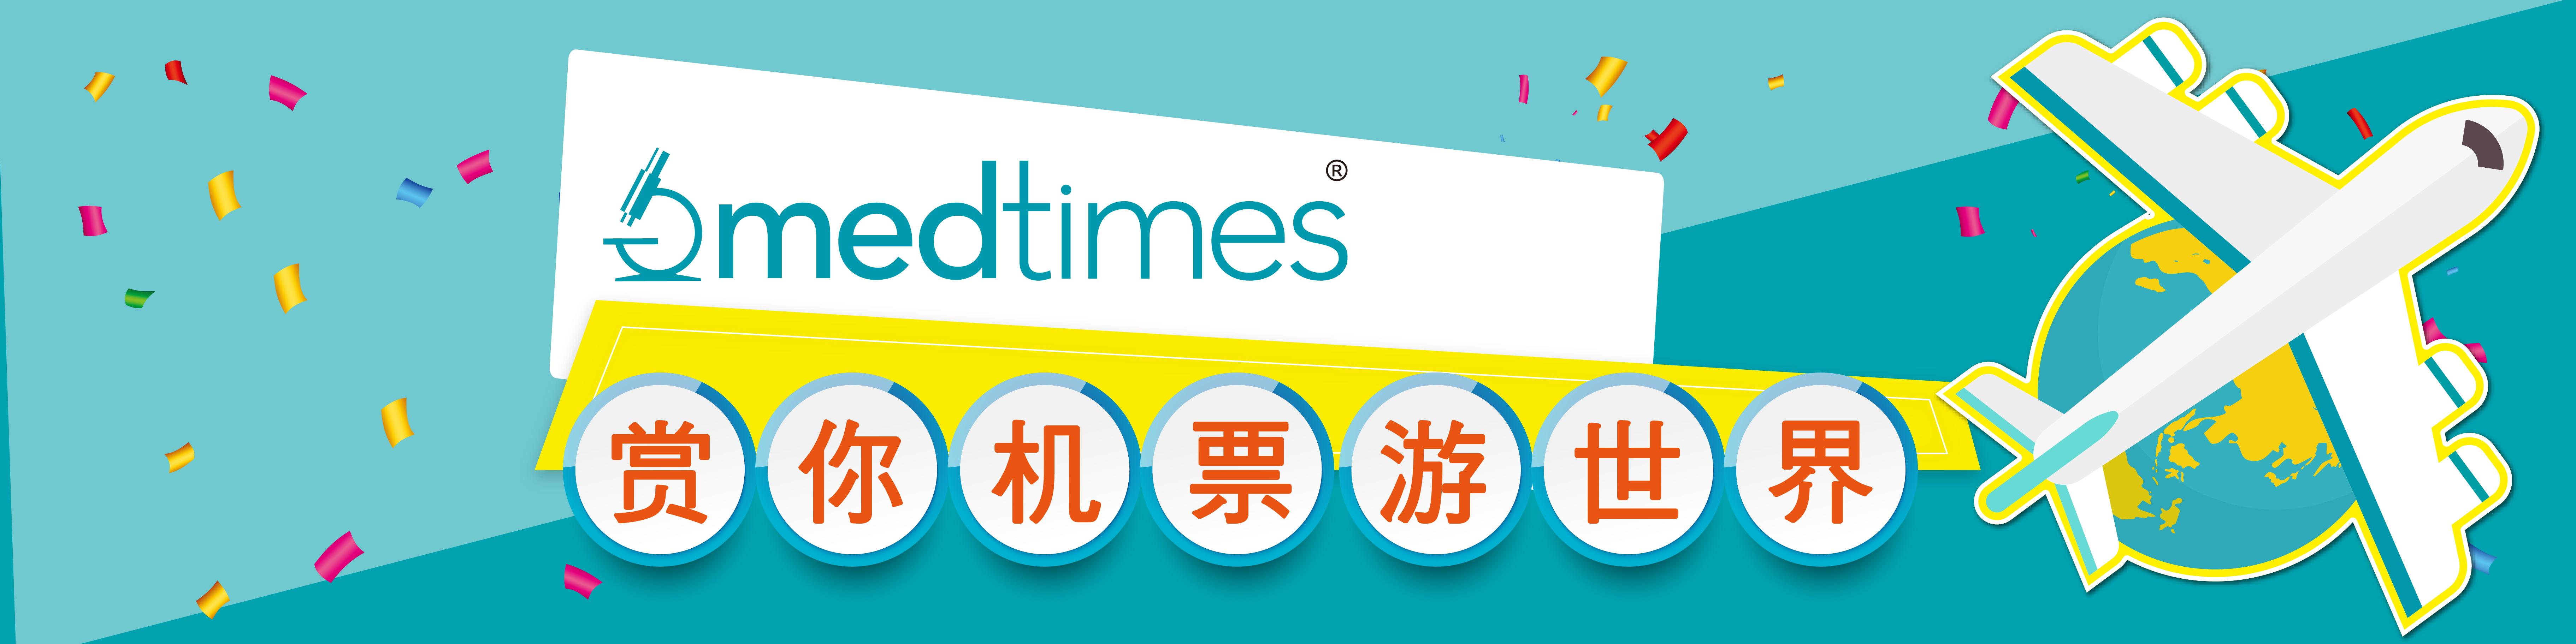 【Medtimes独家优惠】赏您机票游世界